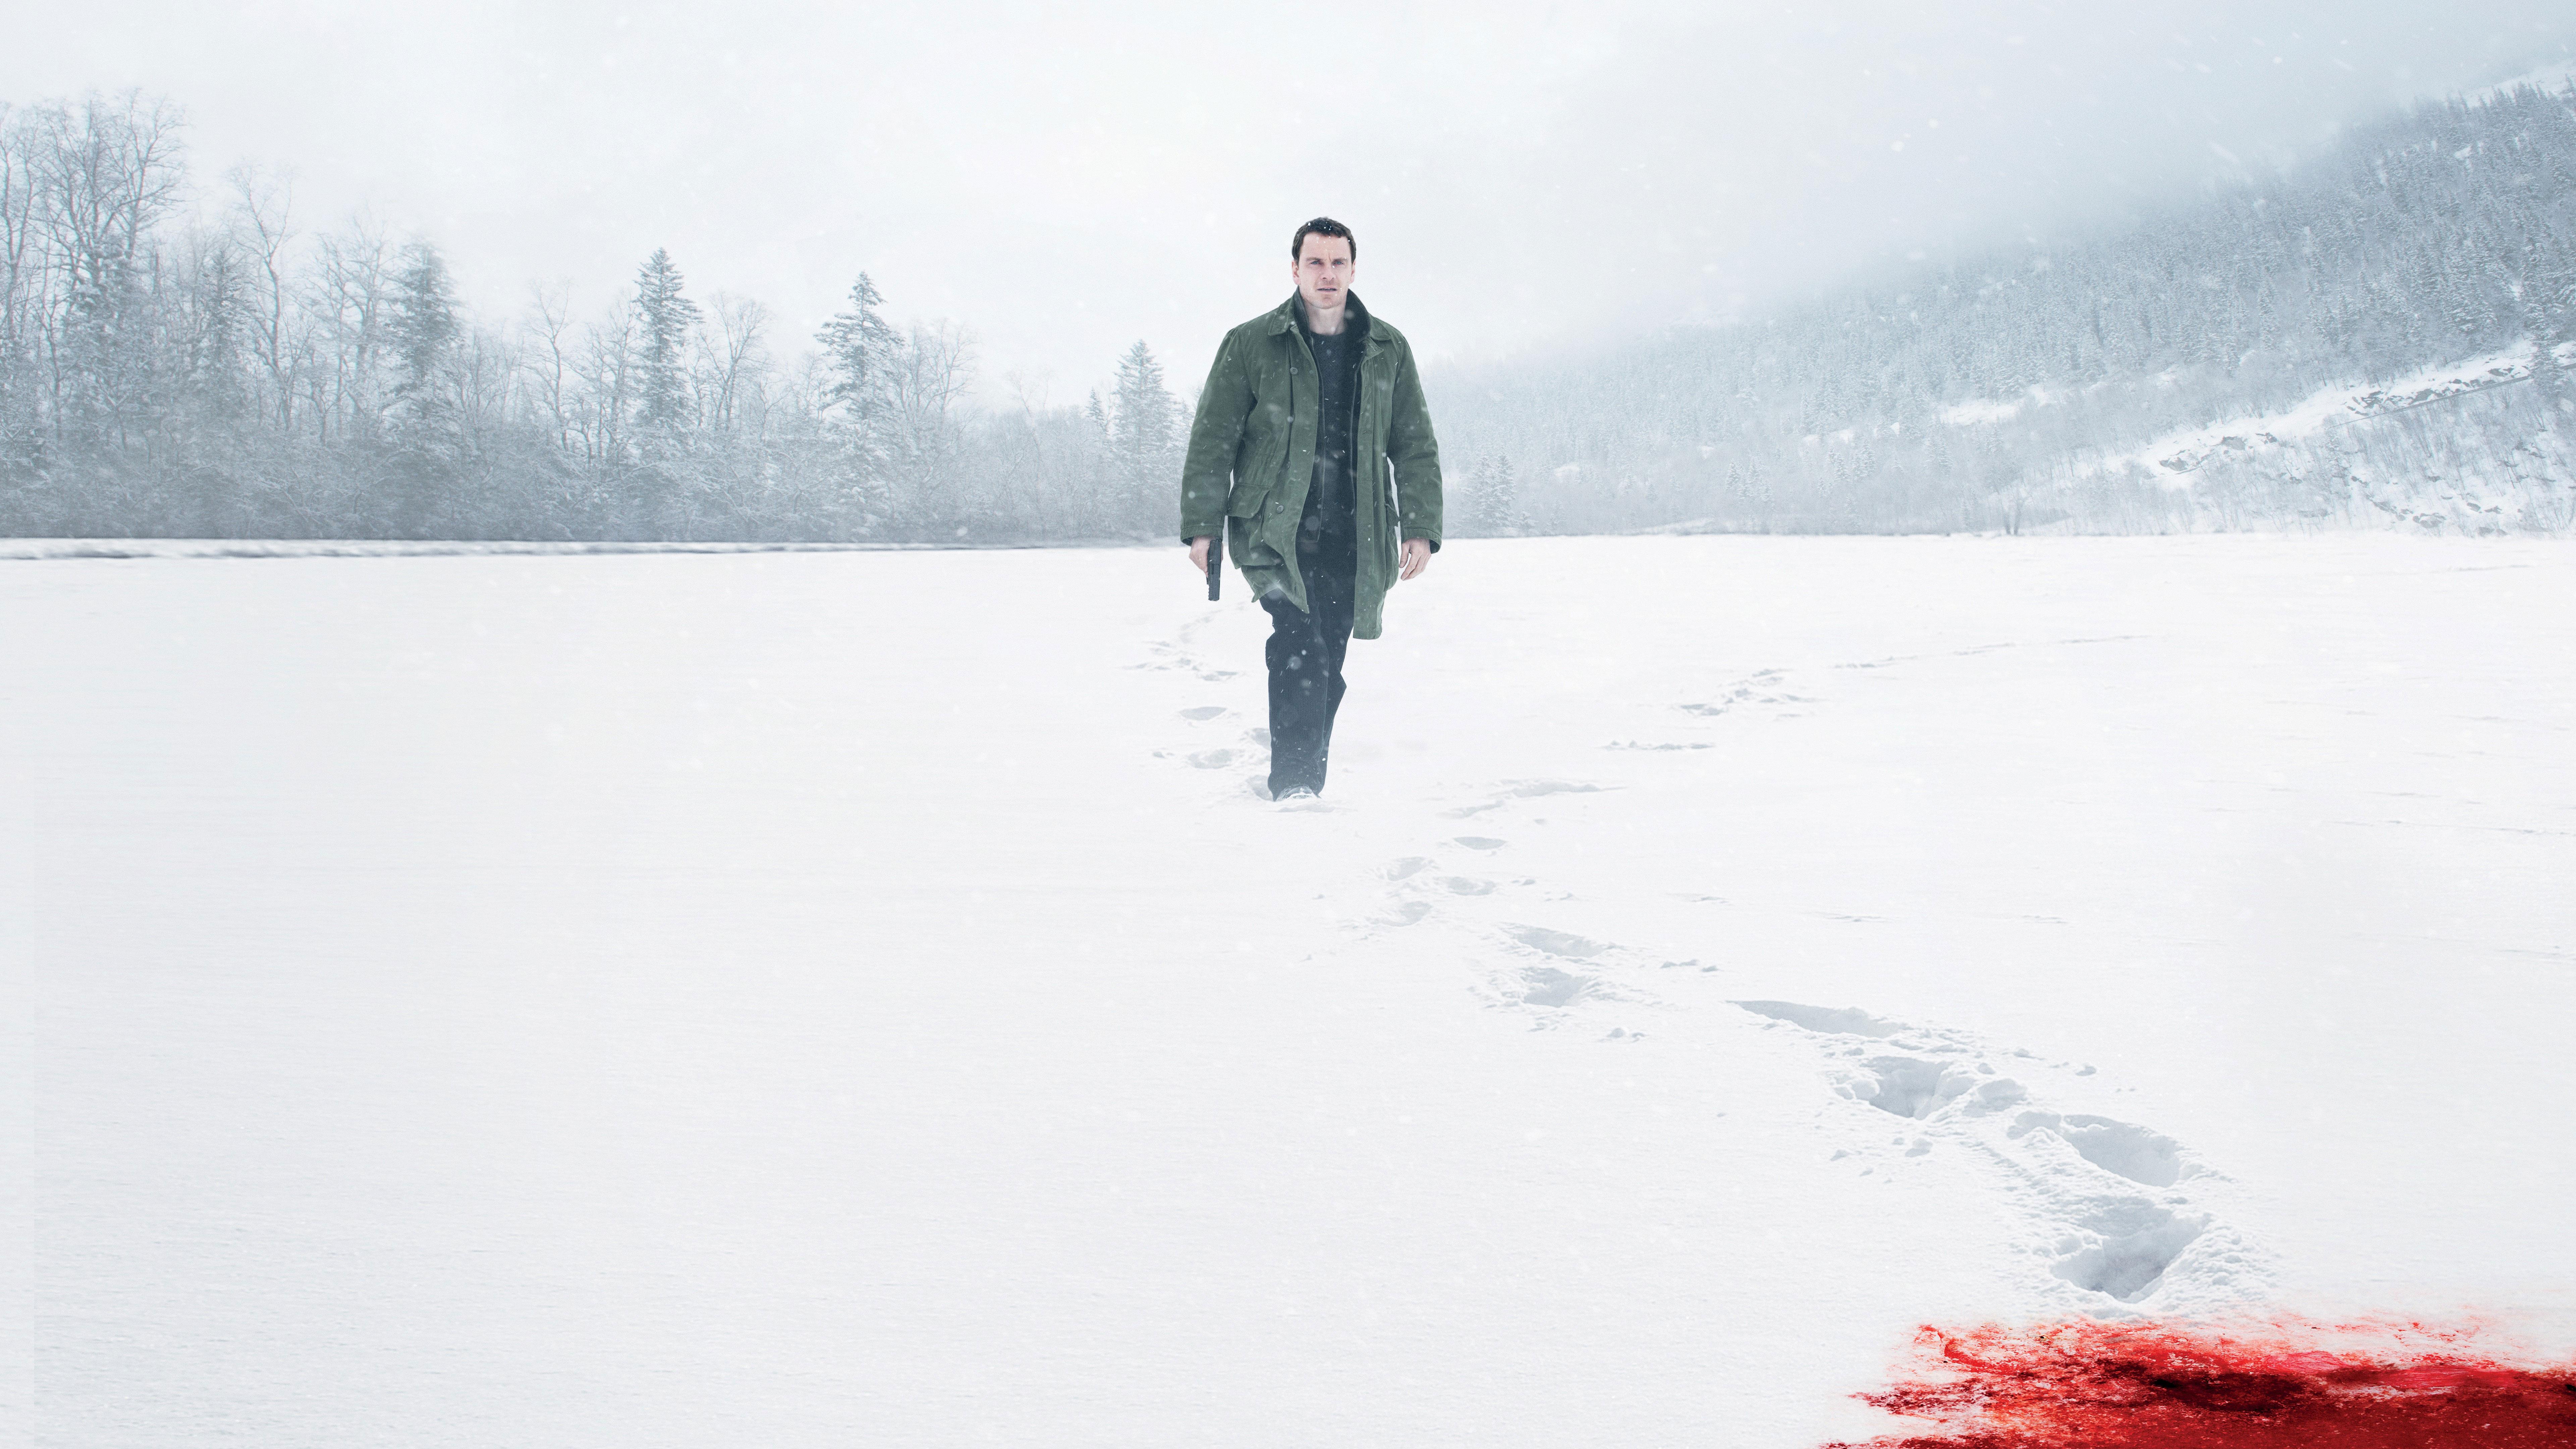 the-snowman-2017-movie-vm